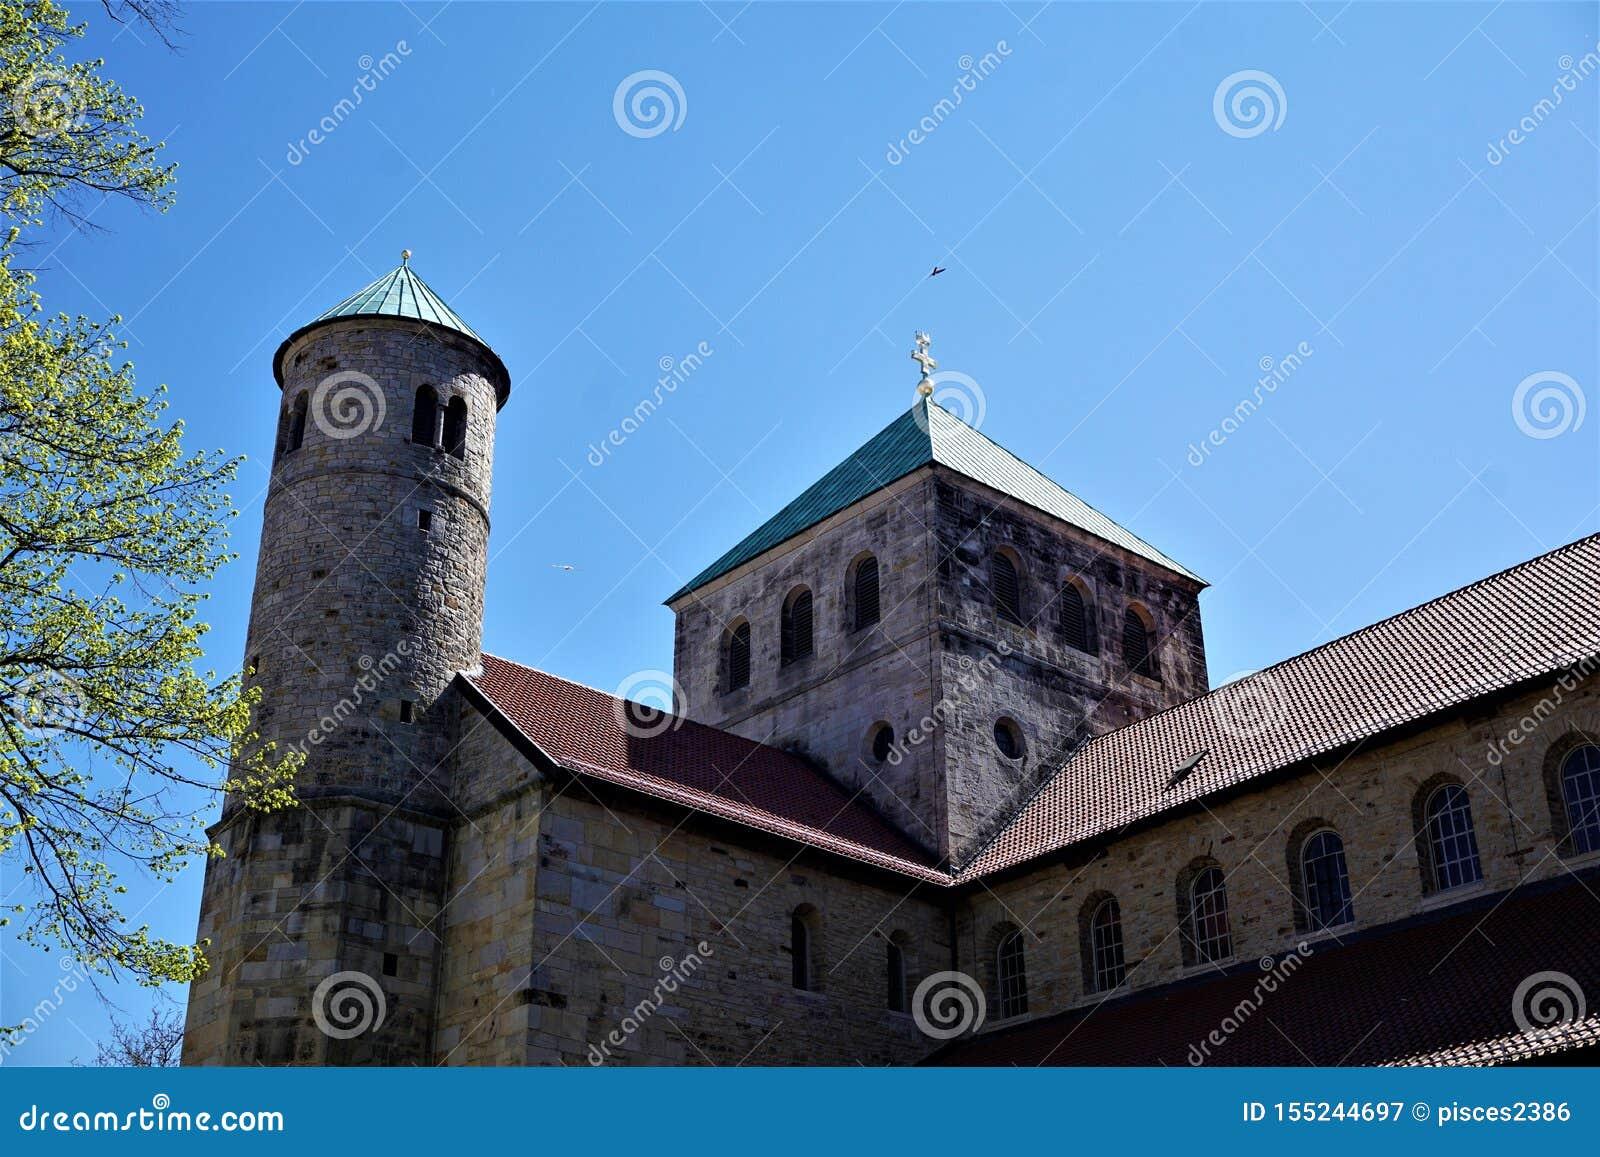 Campanili e rami di albero davanti alla chiesa di St Michael a Hildesheim